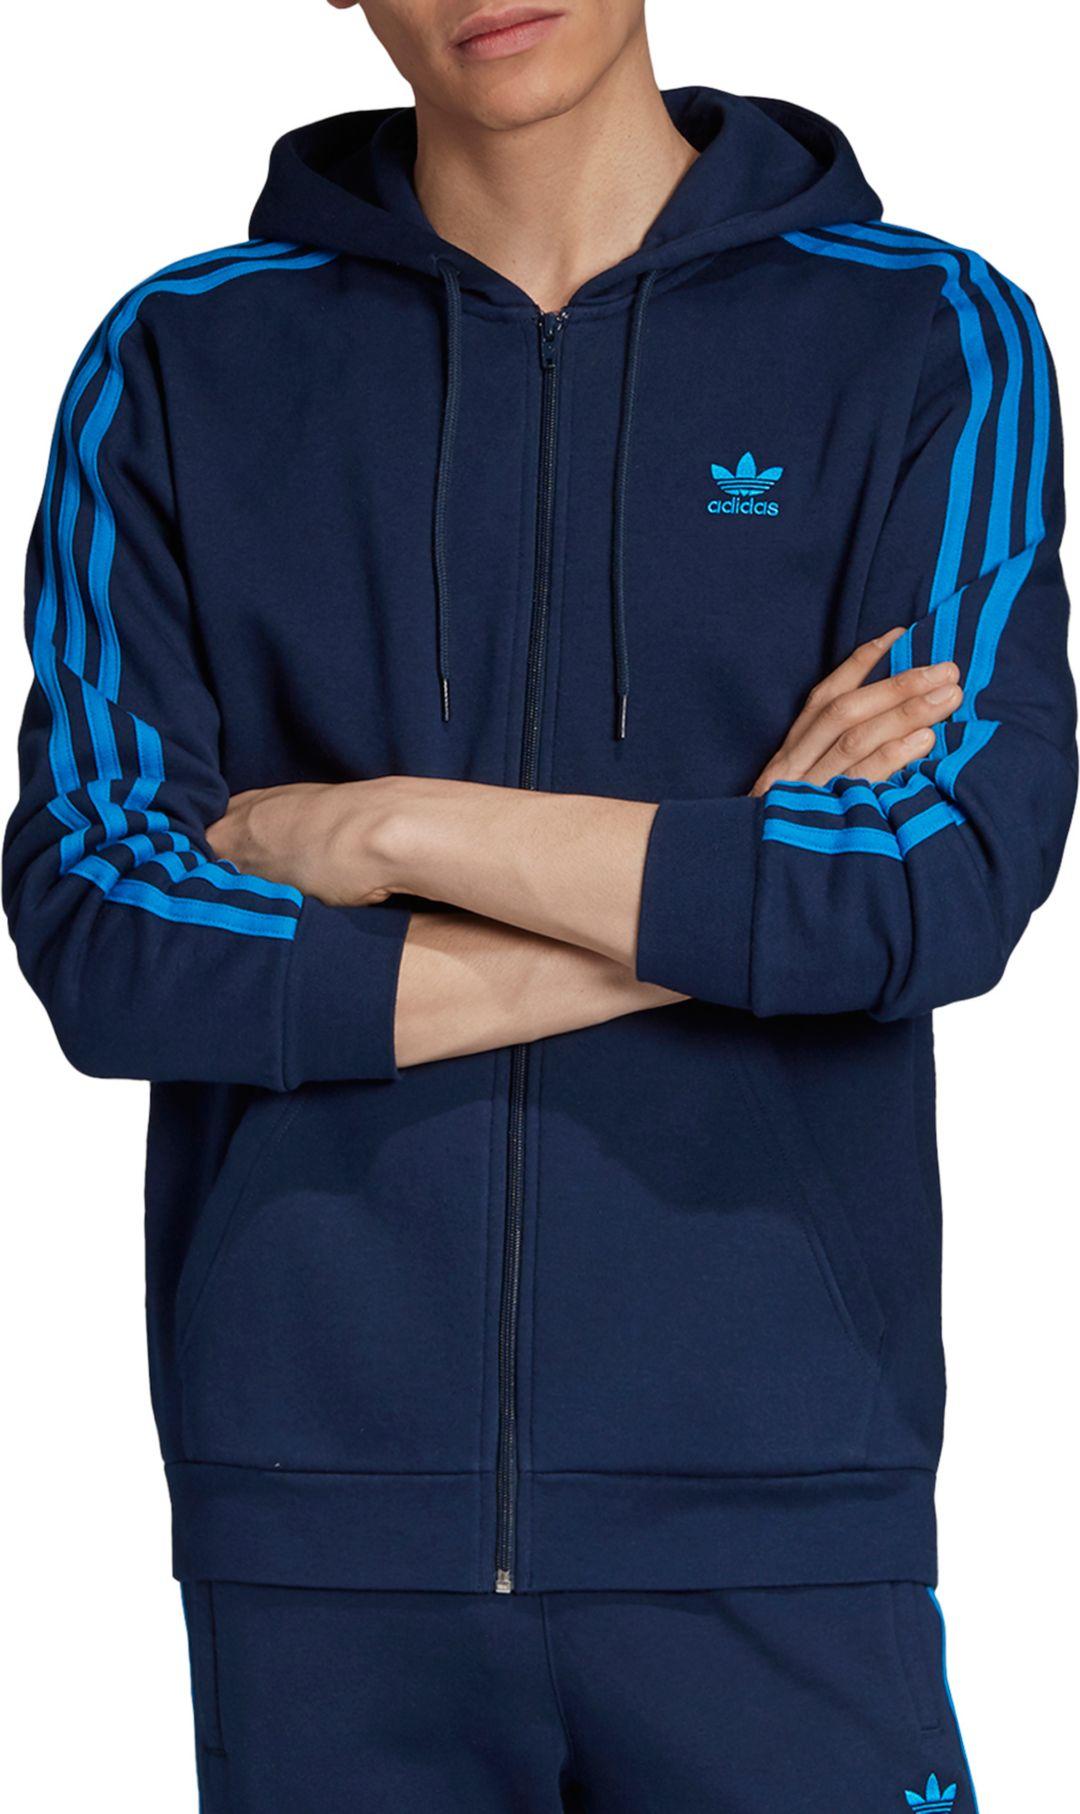 Details about adidas Originals Mens 3 Stripe Windbreaker